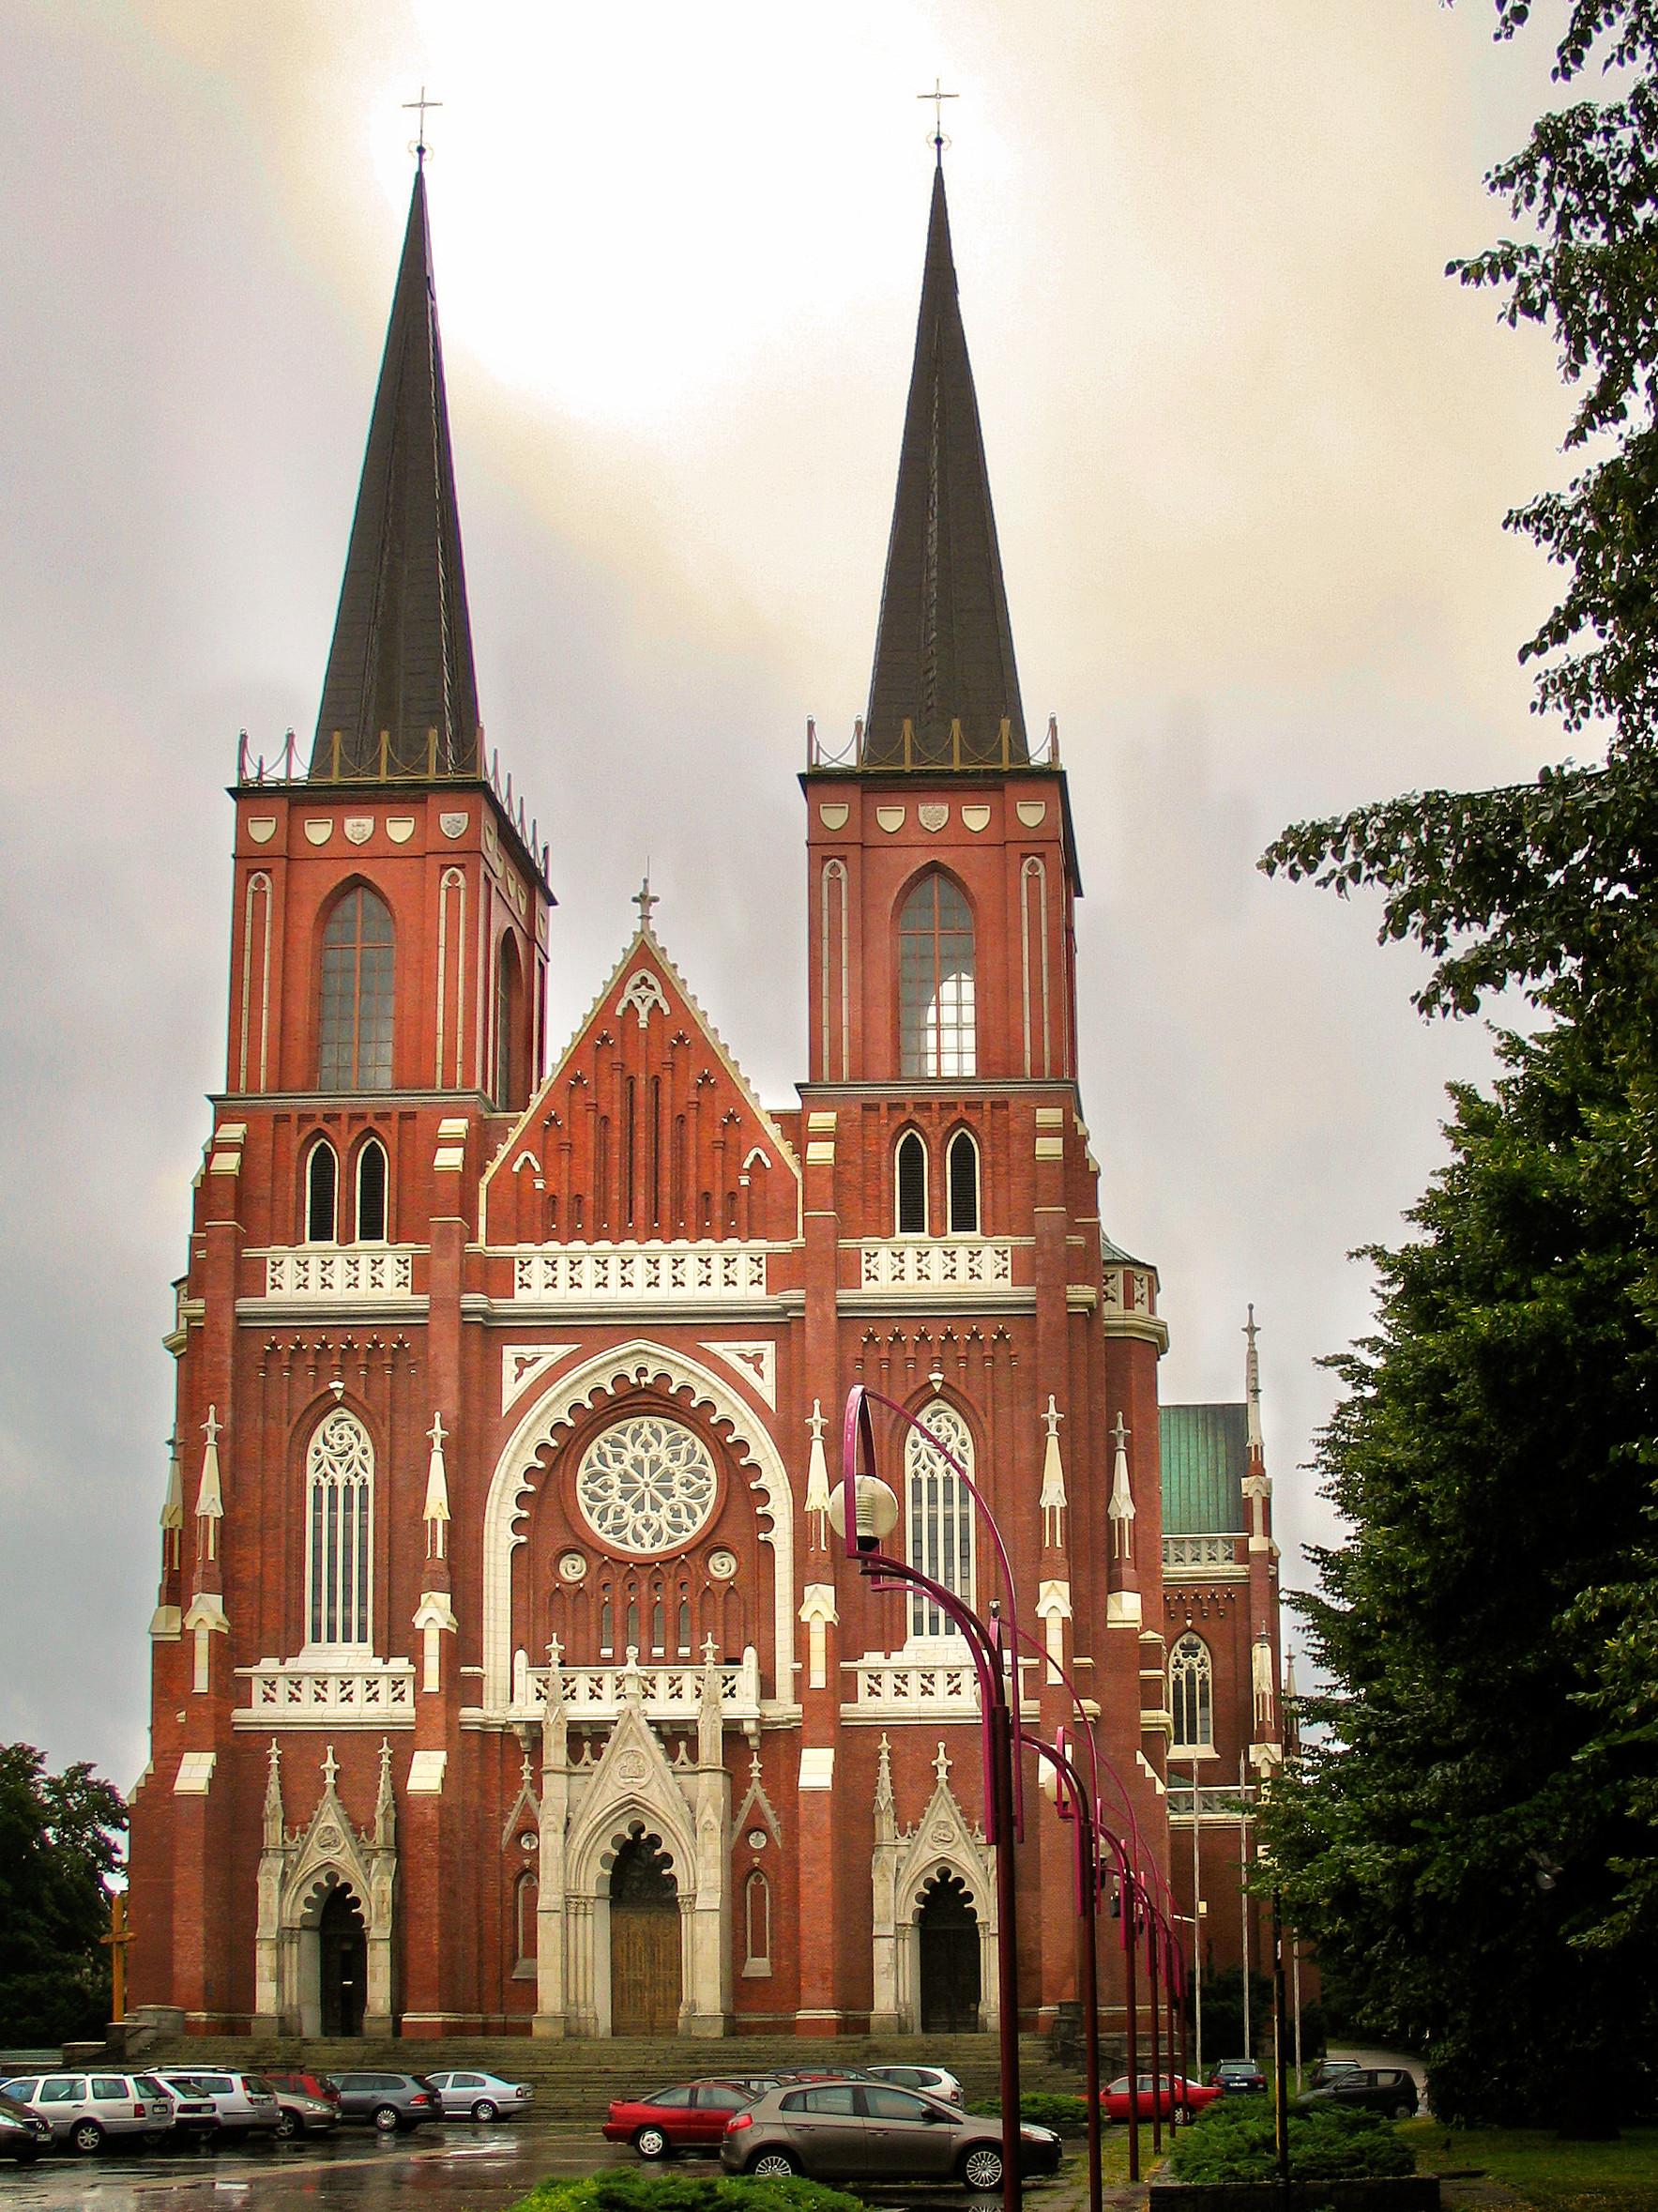 Our Lady of Czestochowa / The Black Madonna: Életre szóló élmény.